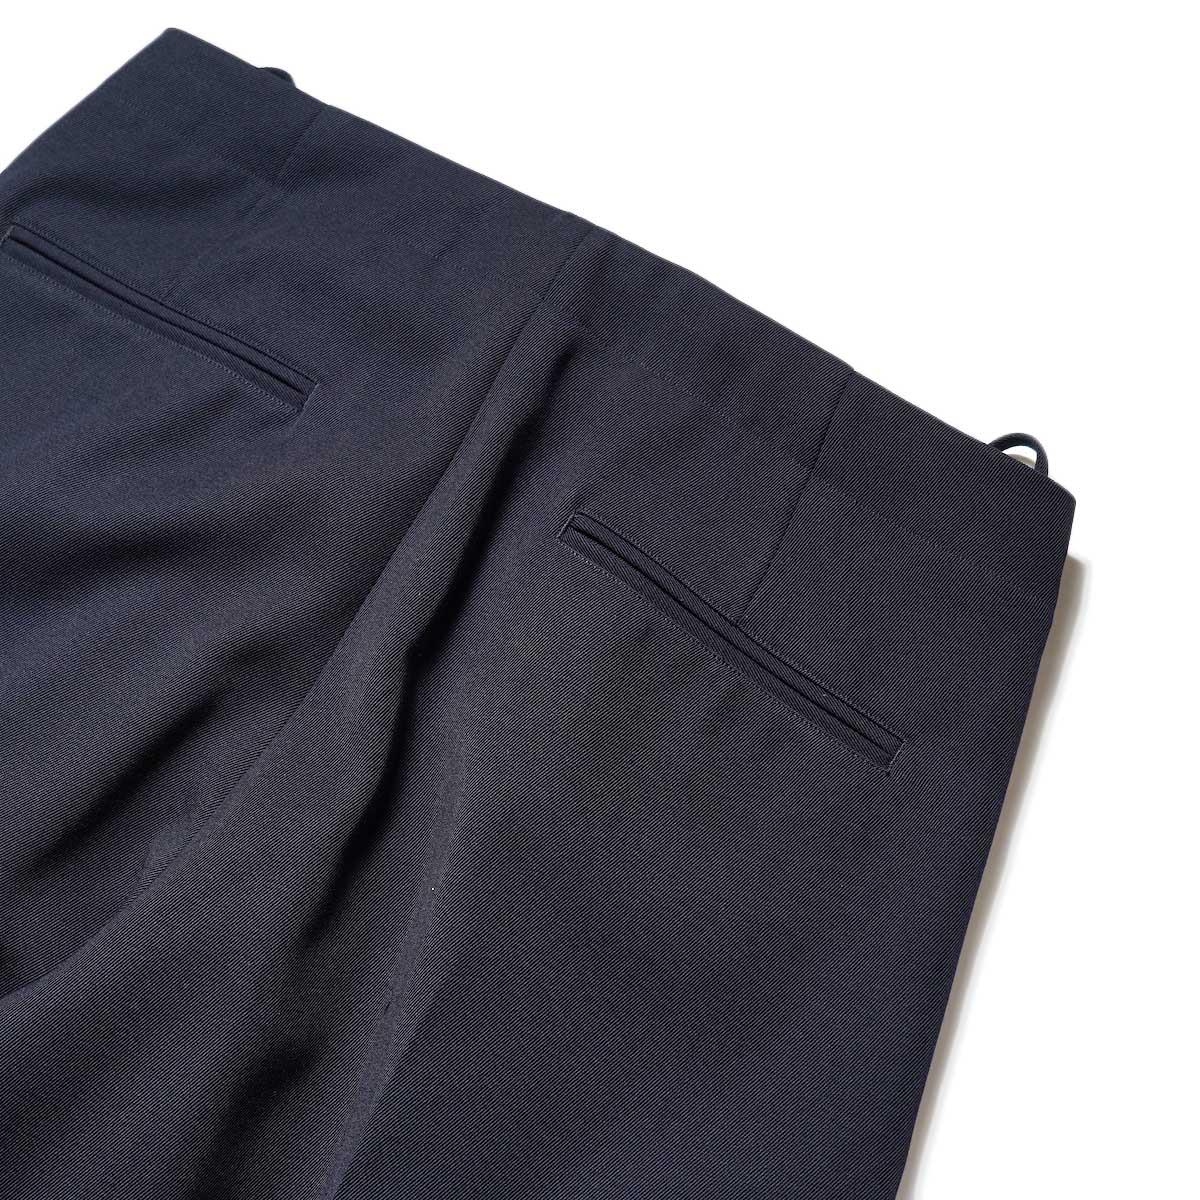 Blurhms / Wool Surge Super Wide Easy Slacks (Dark Navy)ヒップポケット